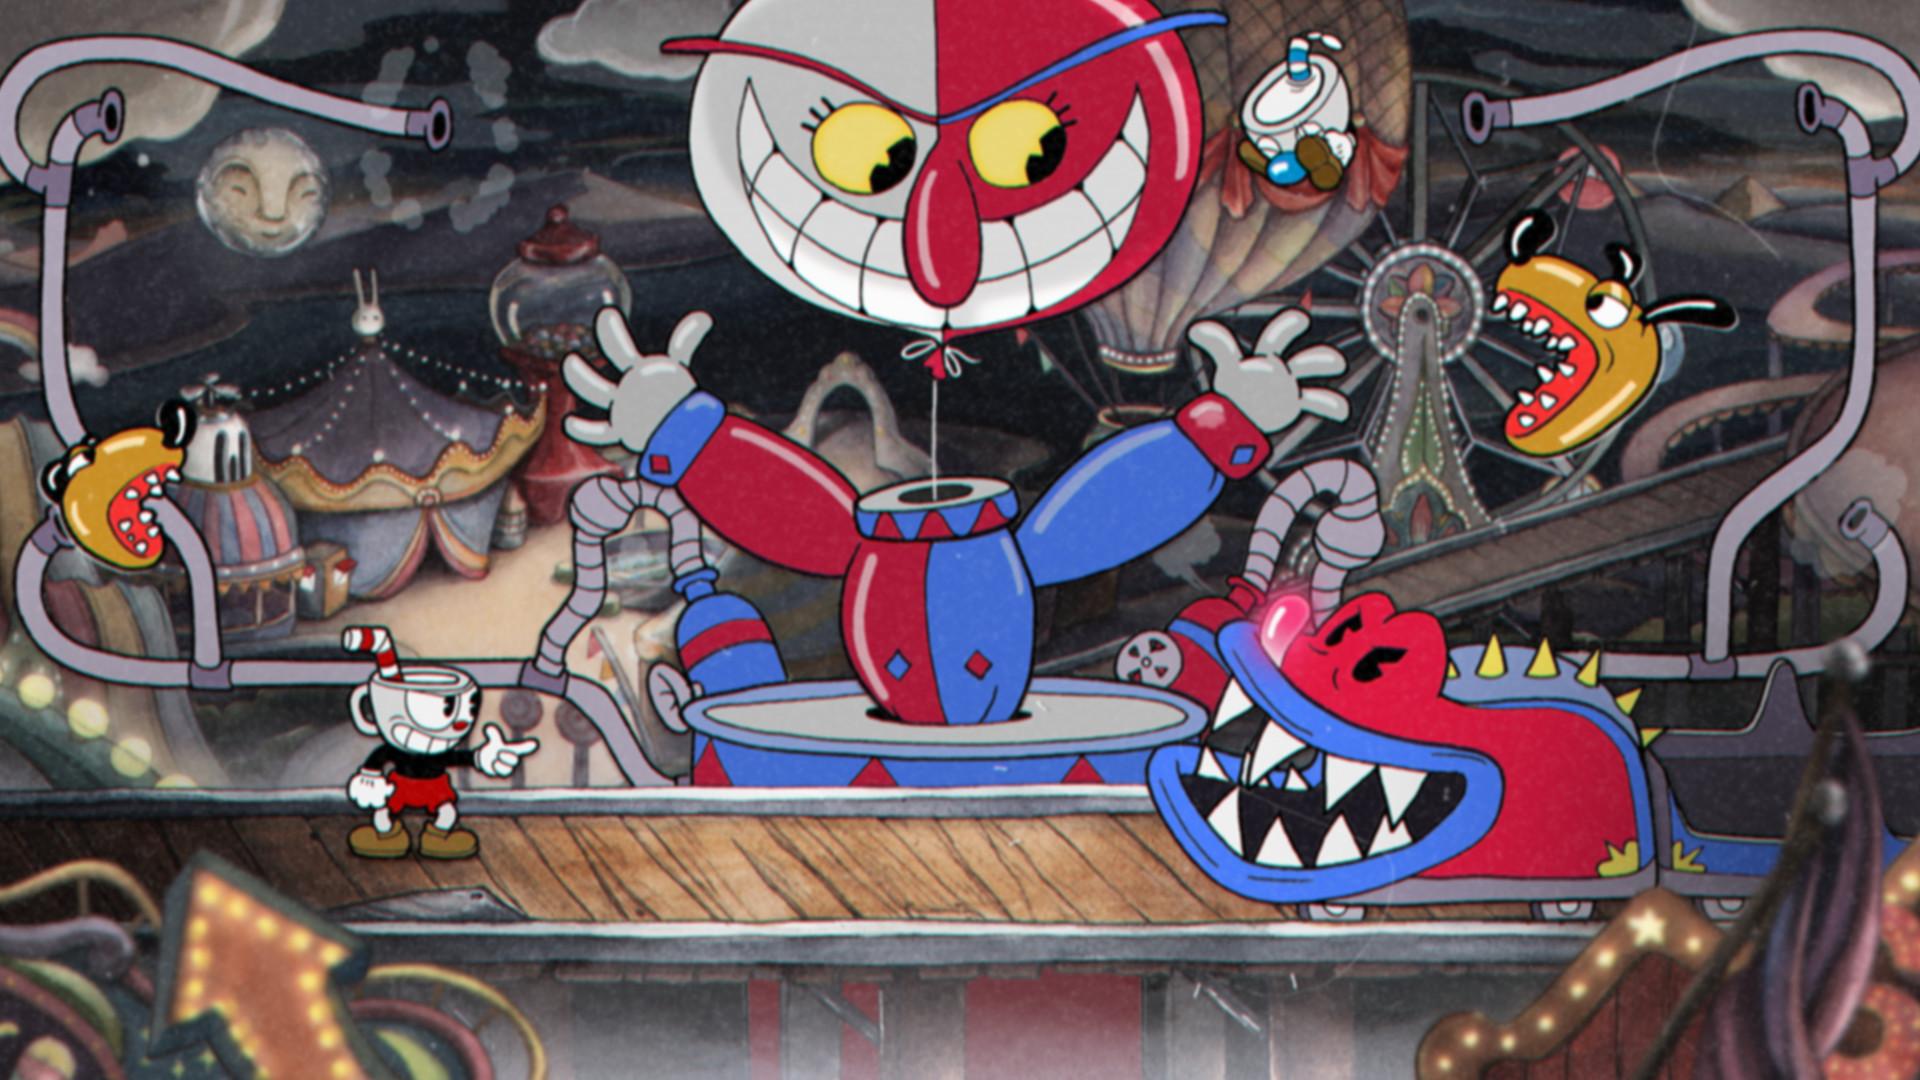 Cuphead - balloon boss with alligator-like enemy